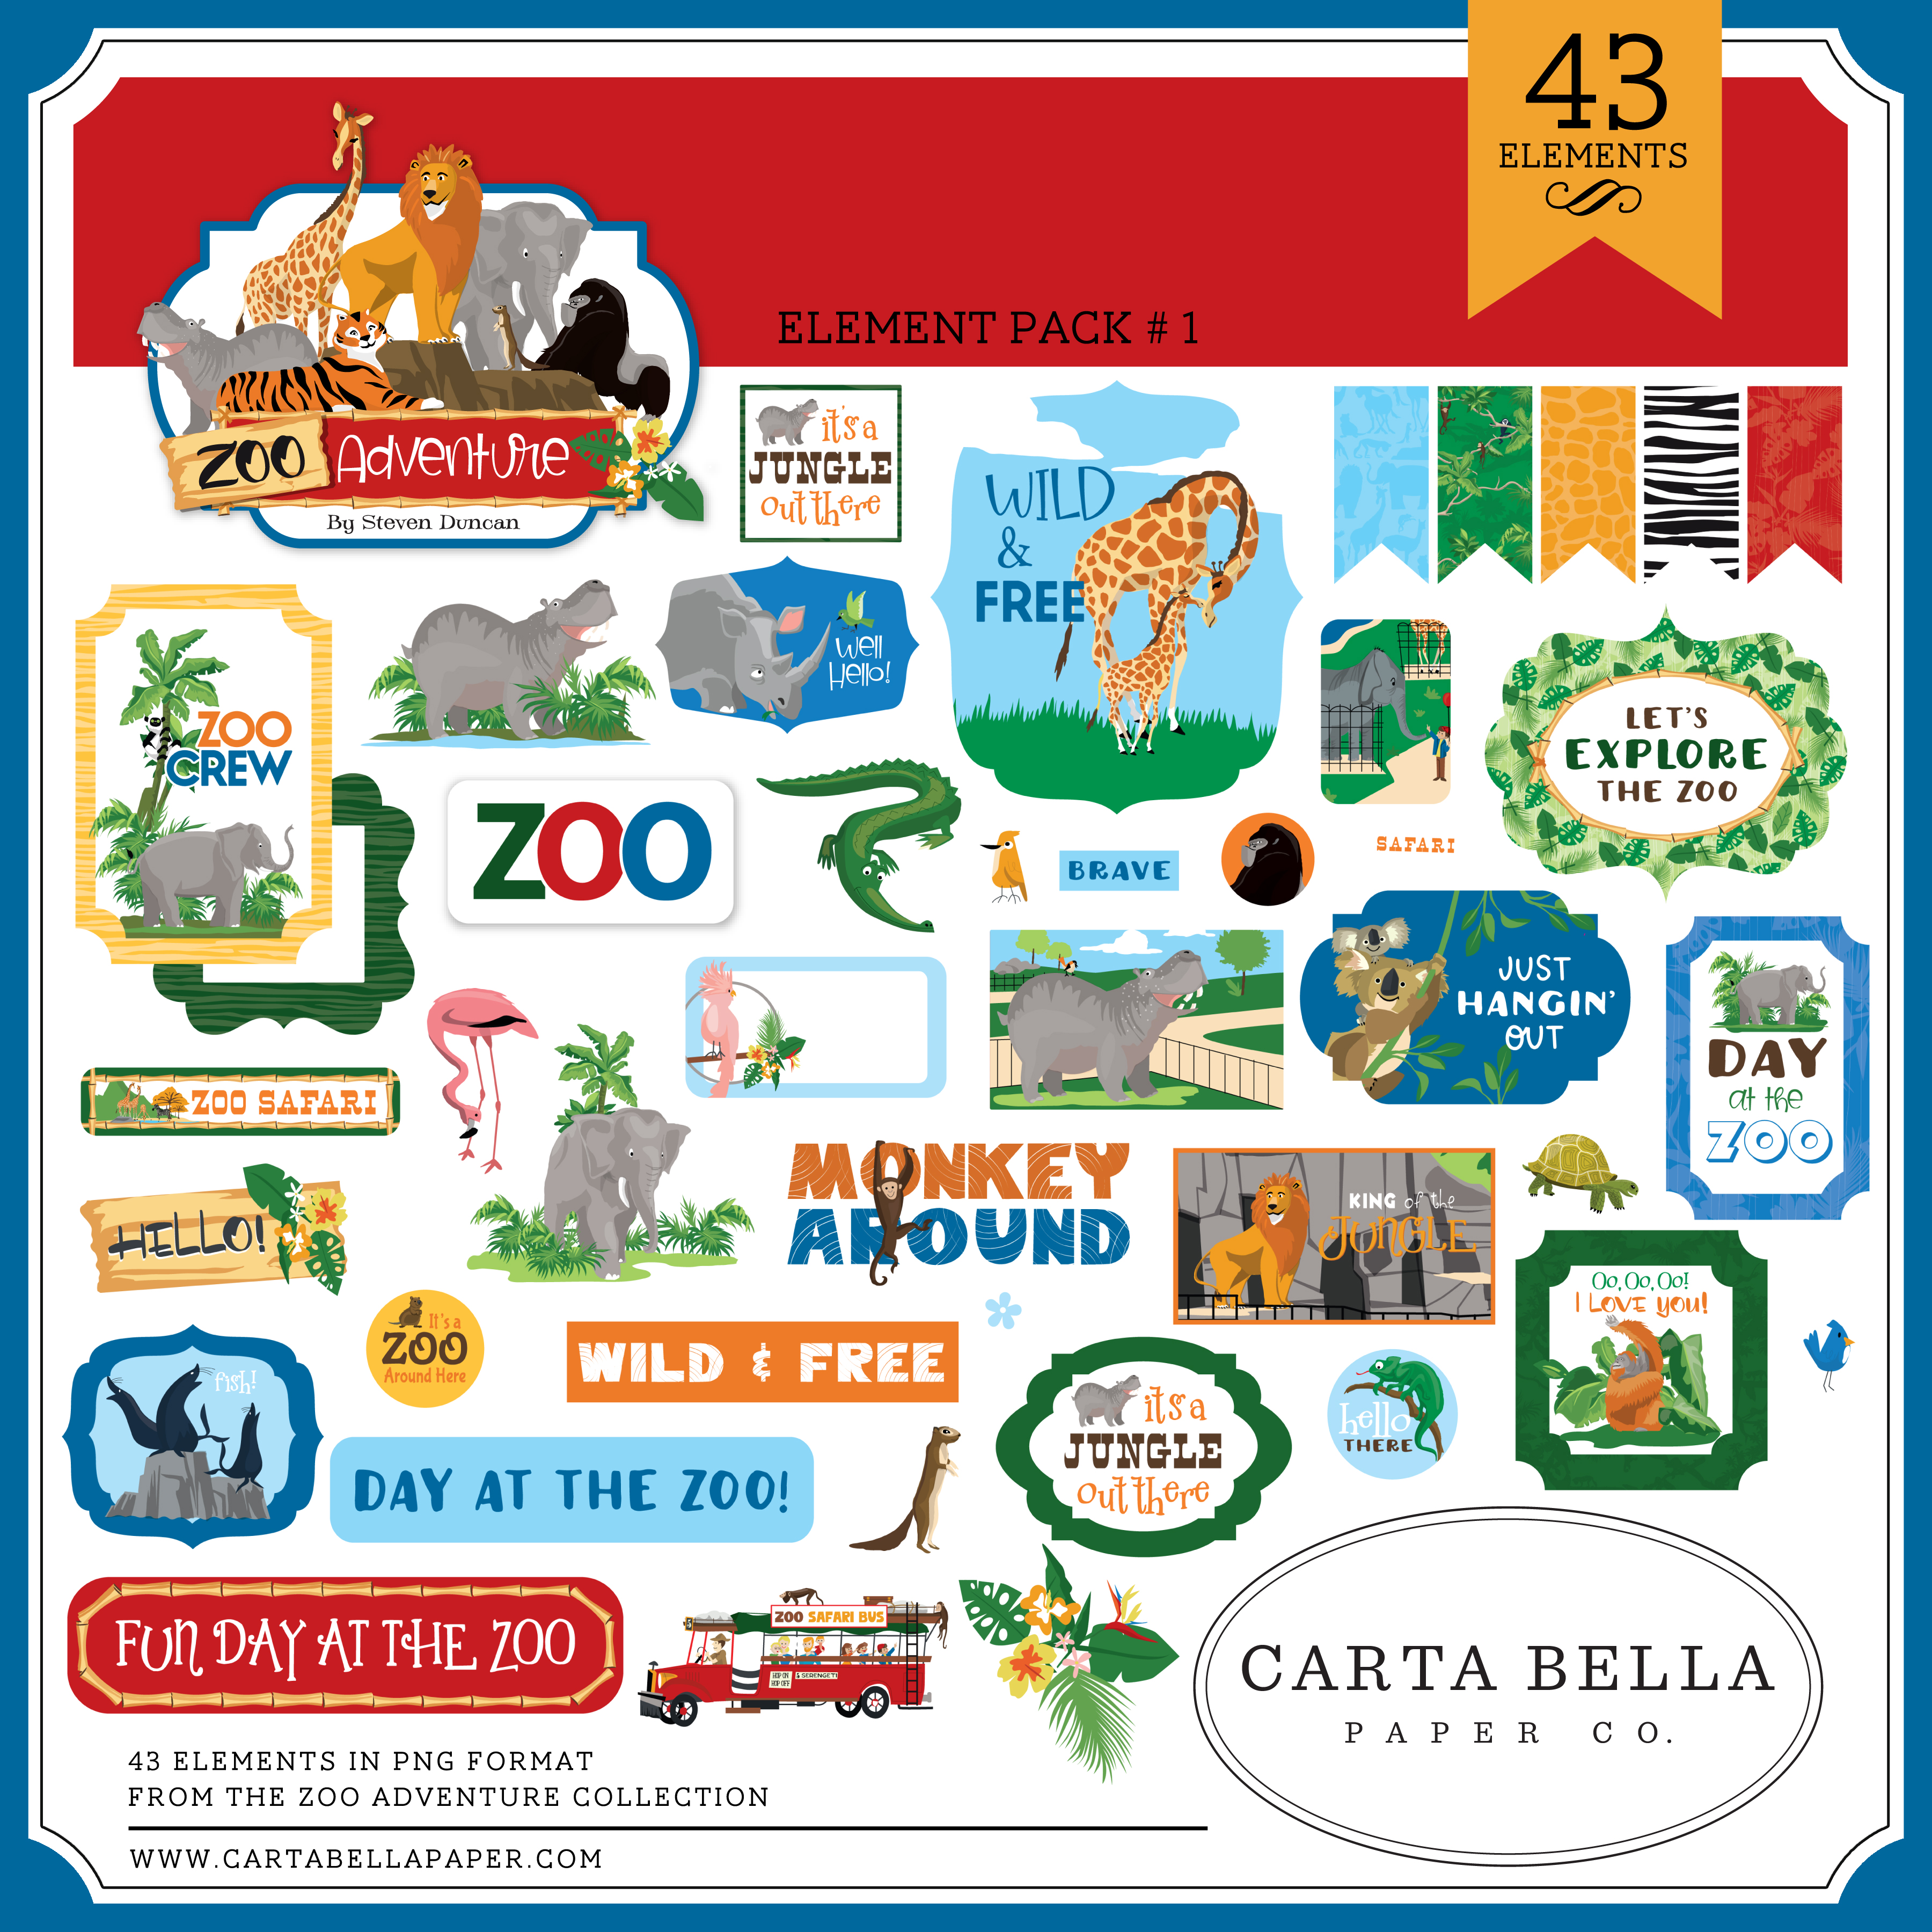 Zoo Adventure Element Pack #1